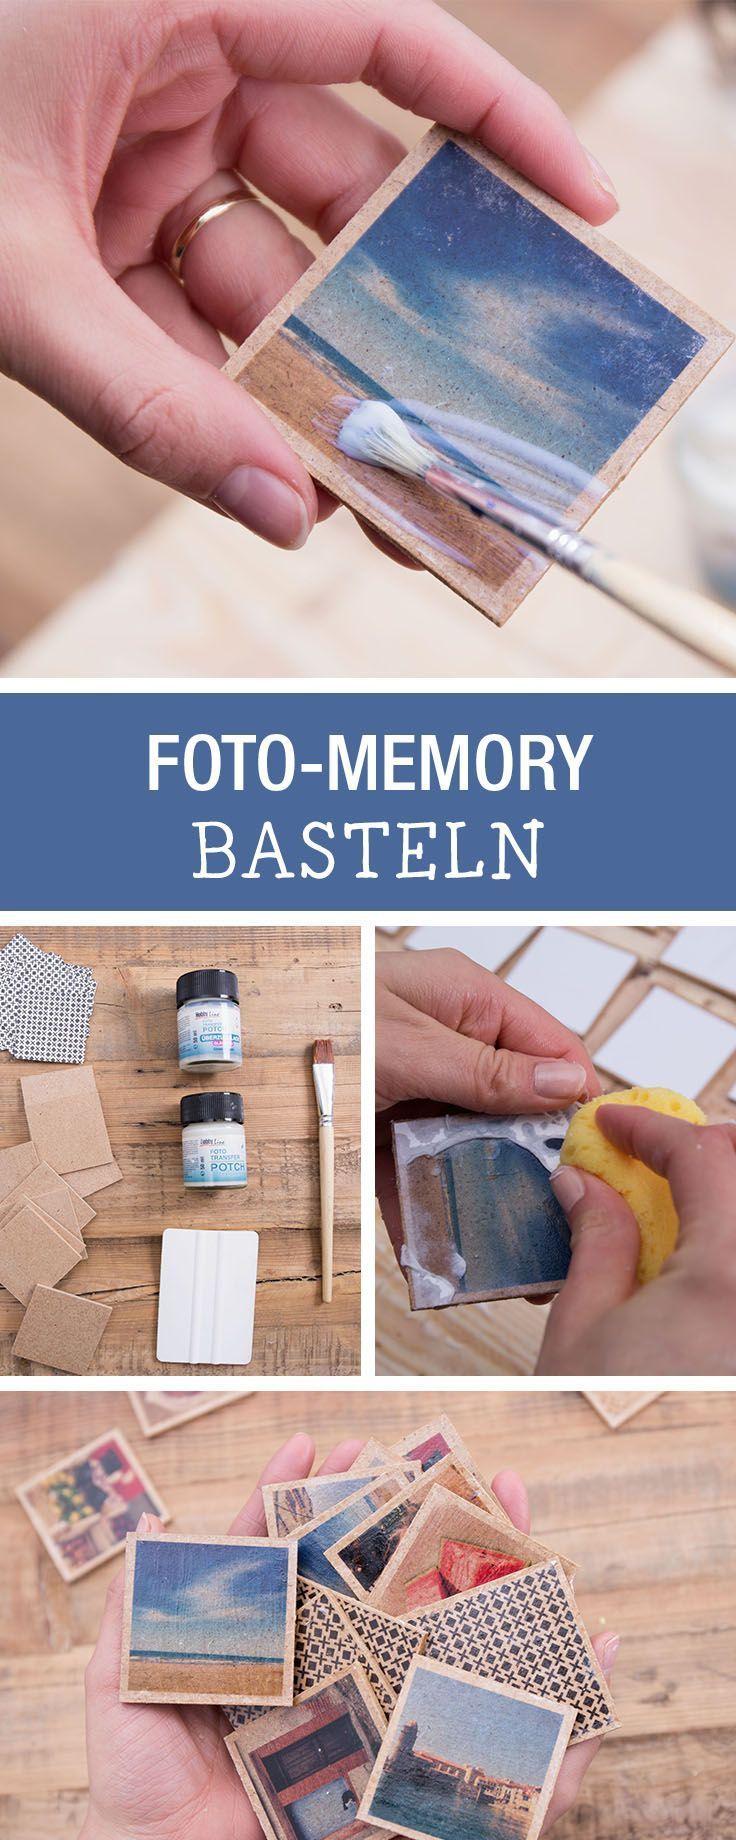 DIY-Anleitung: Foto-Memory mit besonderen Erinnerungen aufbewahren / DIY tutorial: crafting photo memory game for your special memories via DaWanda.com #fotogeschenk